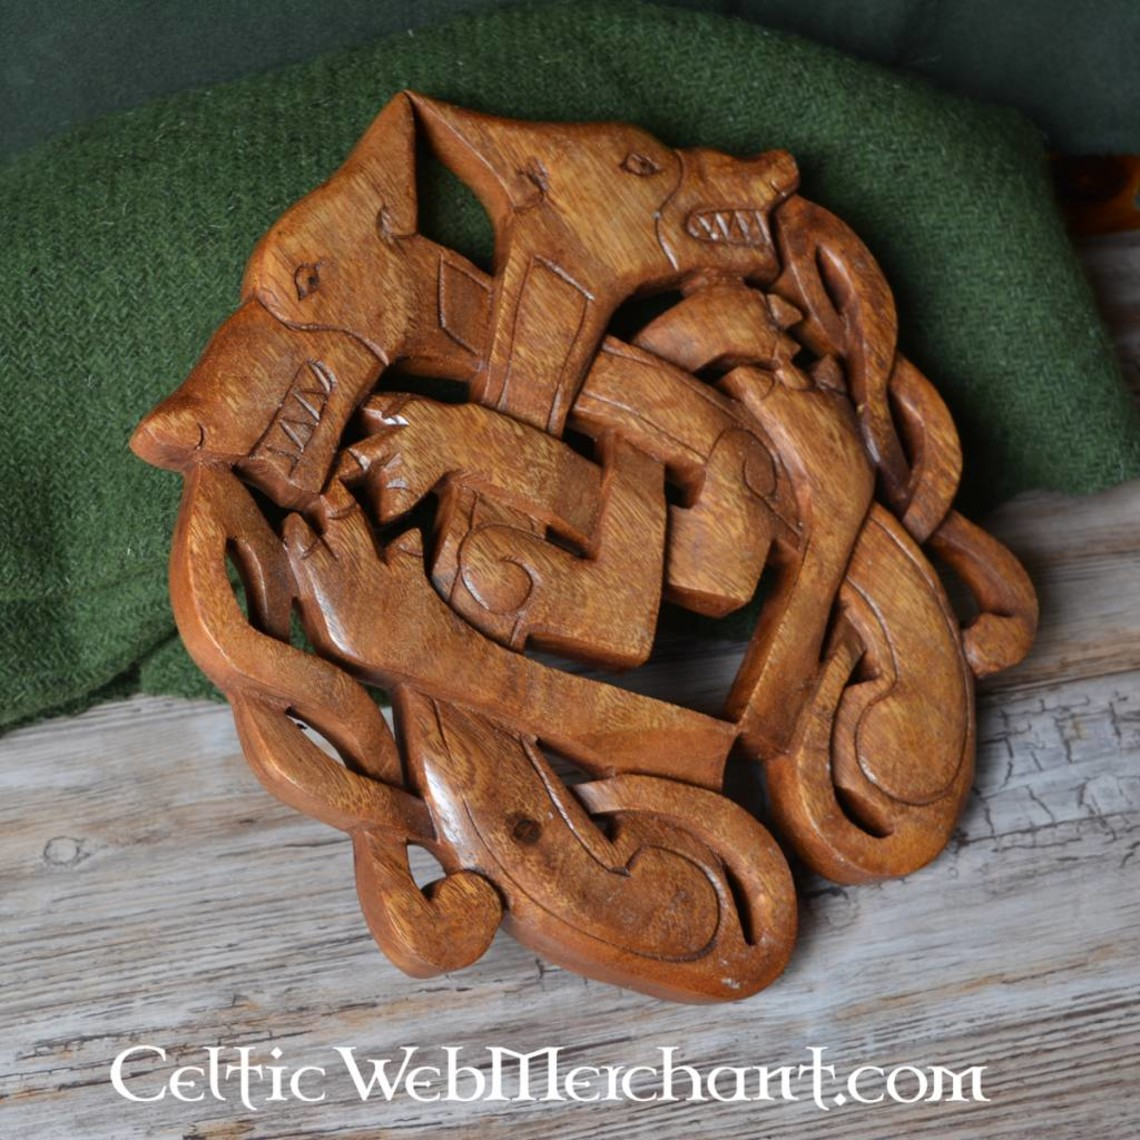 Wooden Odin ulve